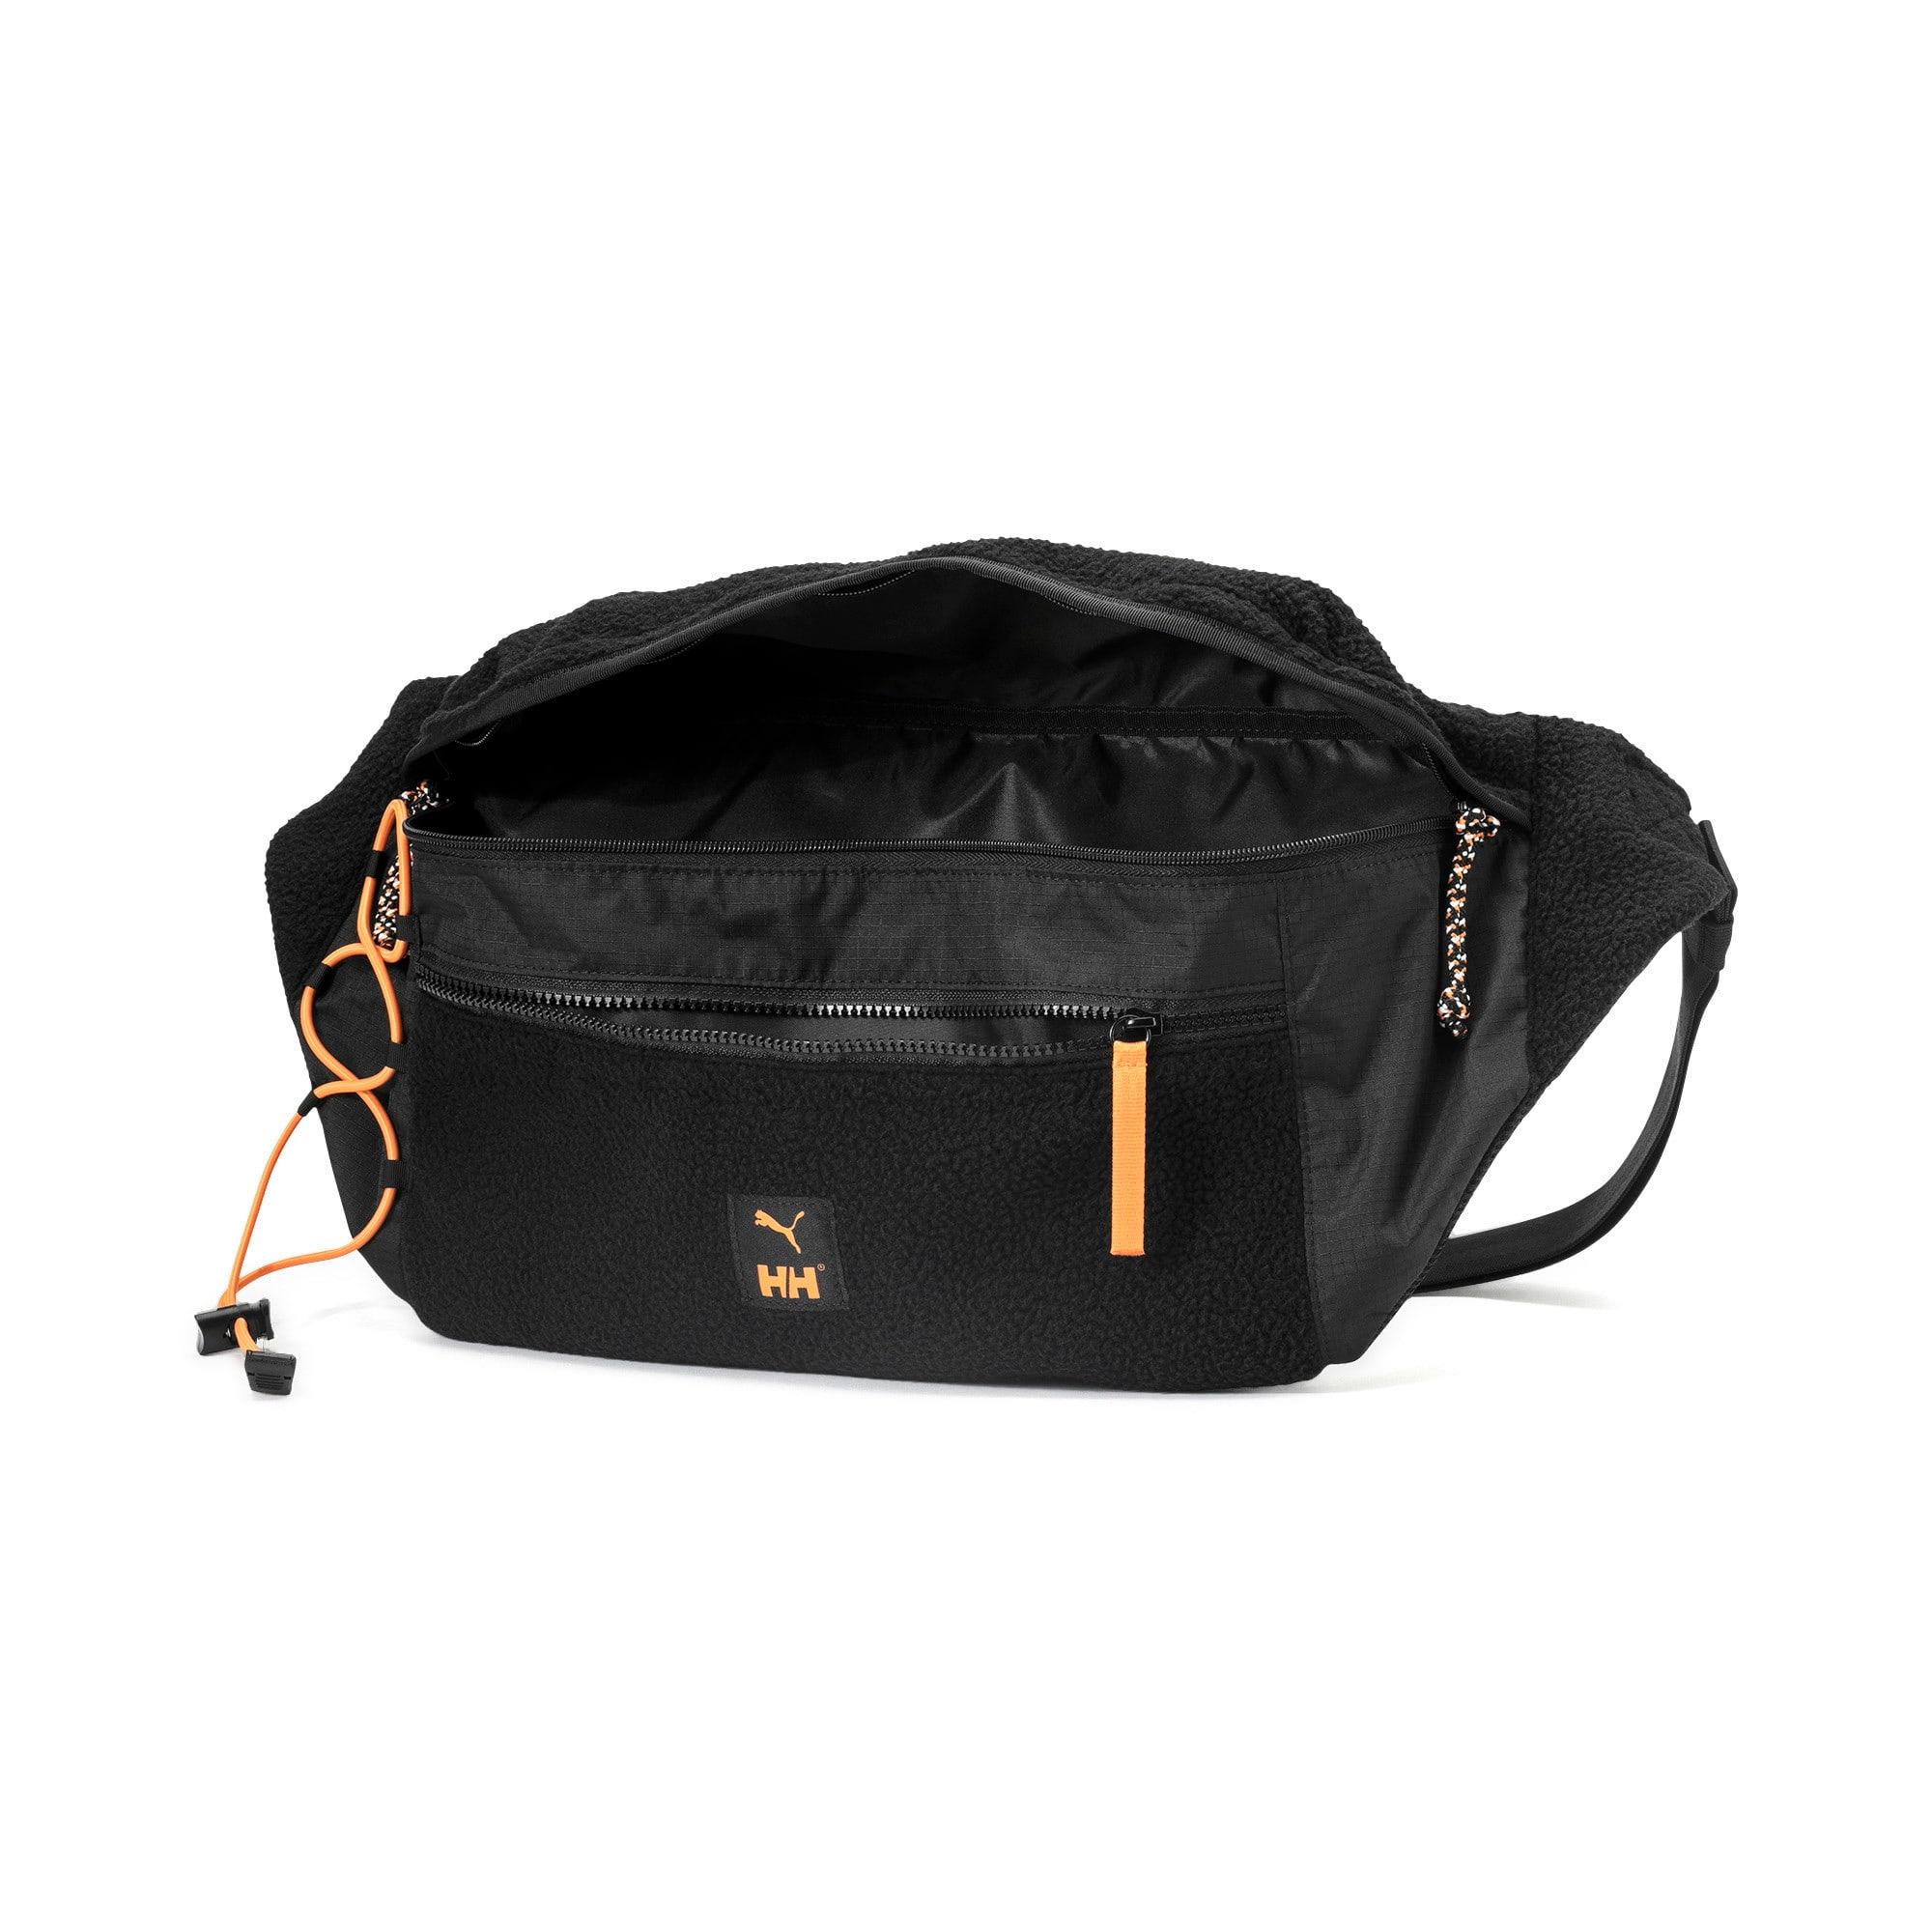 Thumbnail 3 of PUMA x HELLY HANSEN Oversized Waist Bag, Puma Black, medium